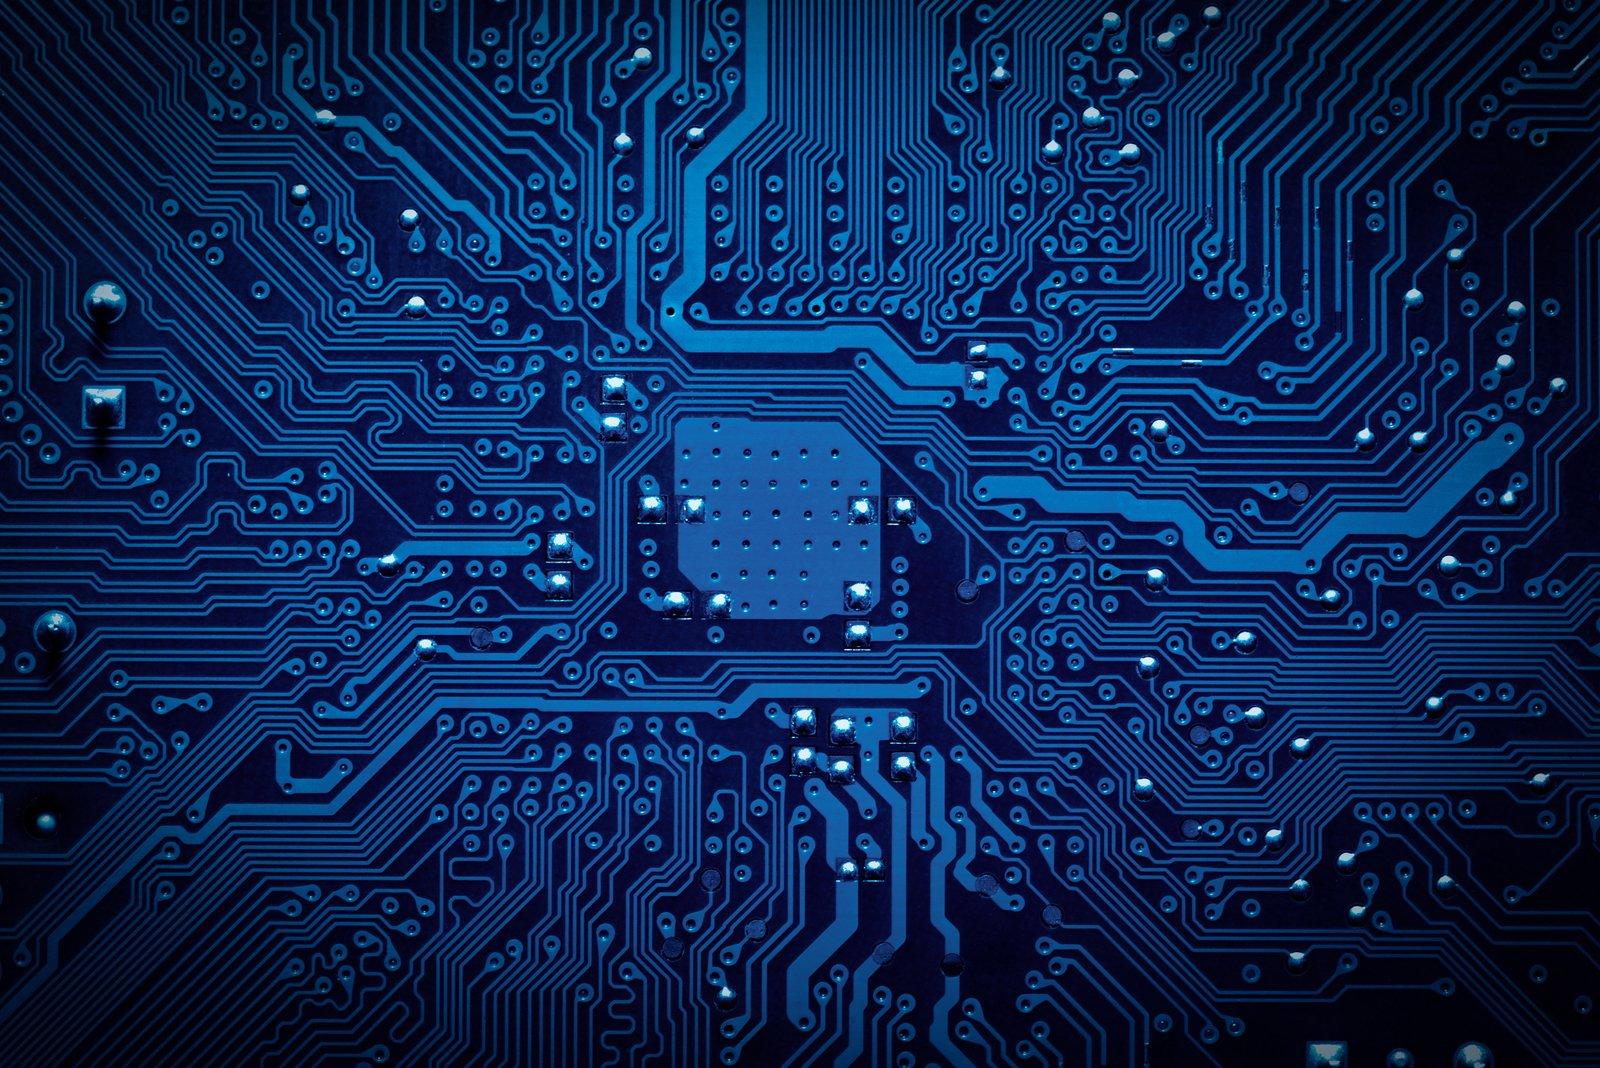 BOM在PCB组装中的重要性是什么